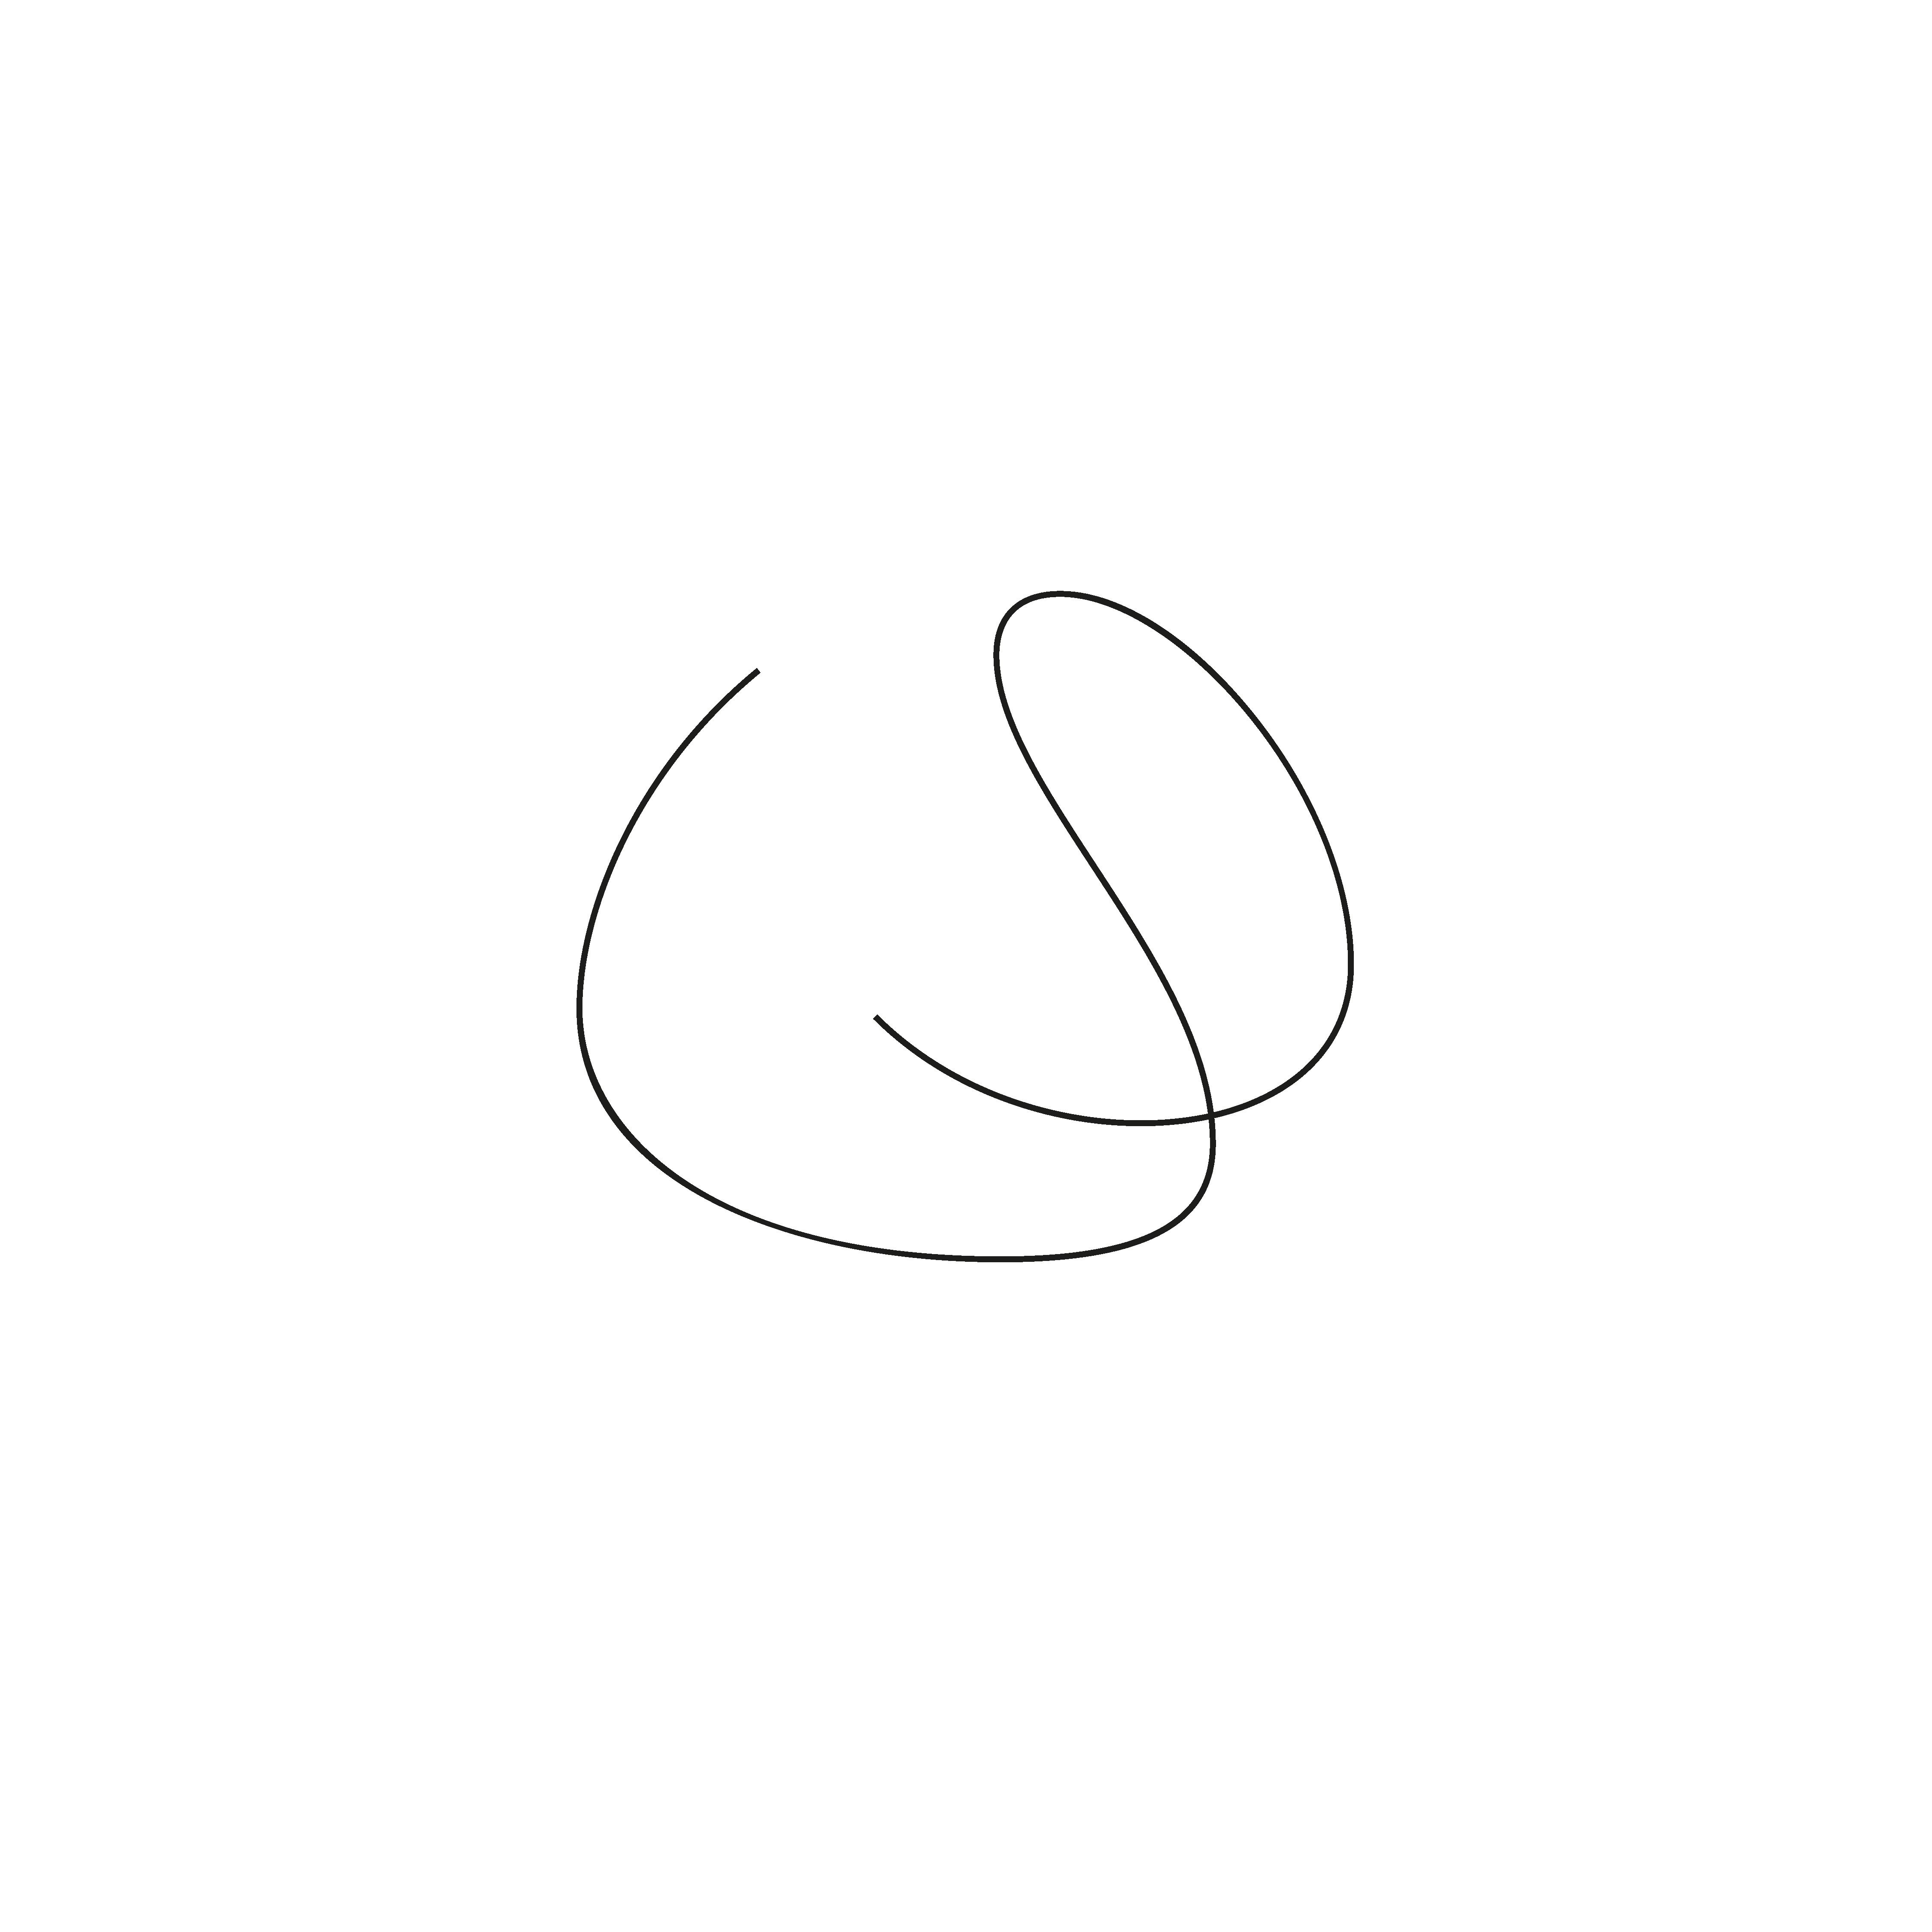 No. 6 – cuff fold - sketch